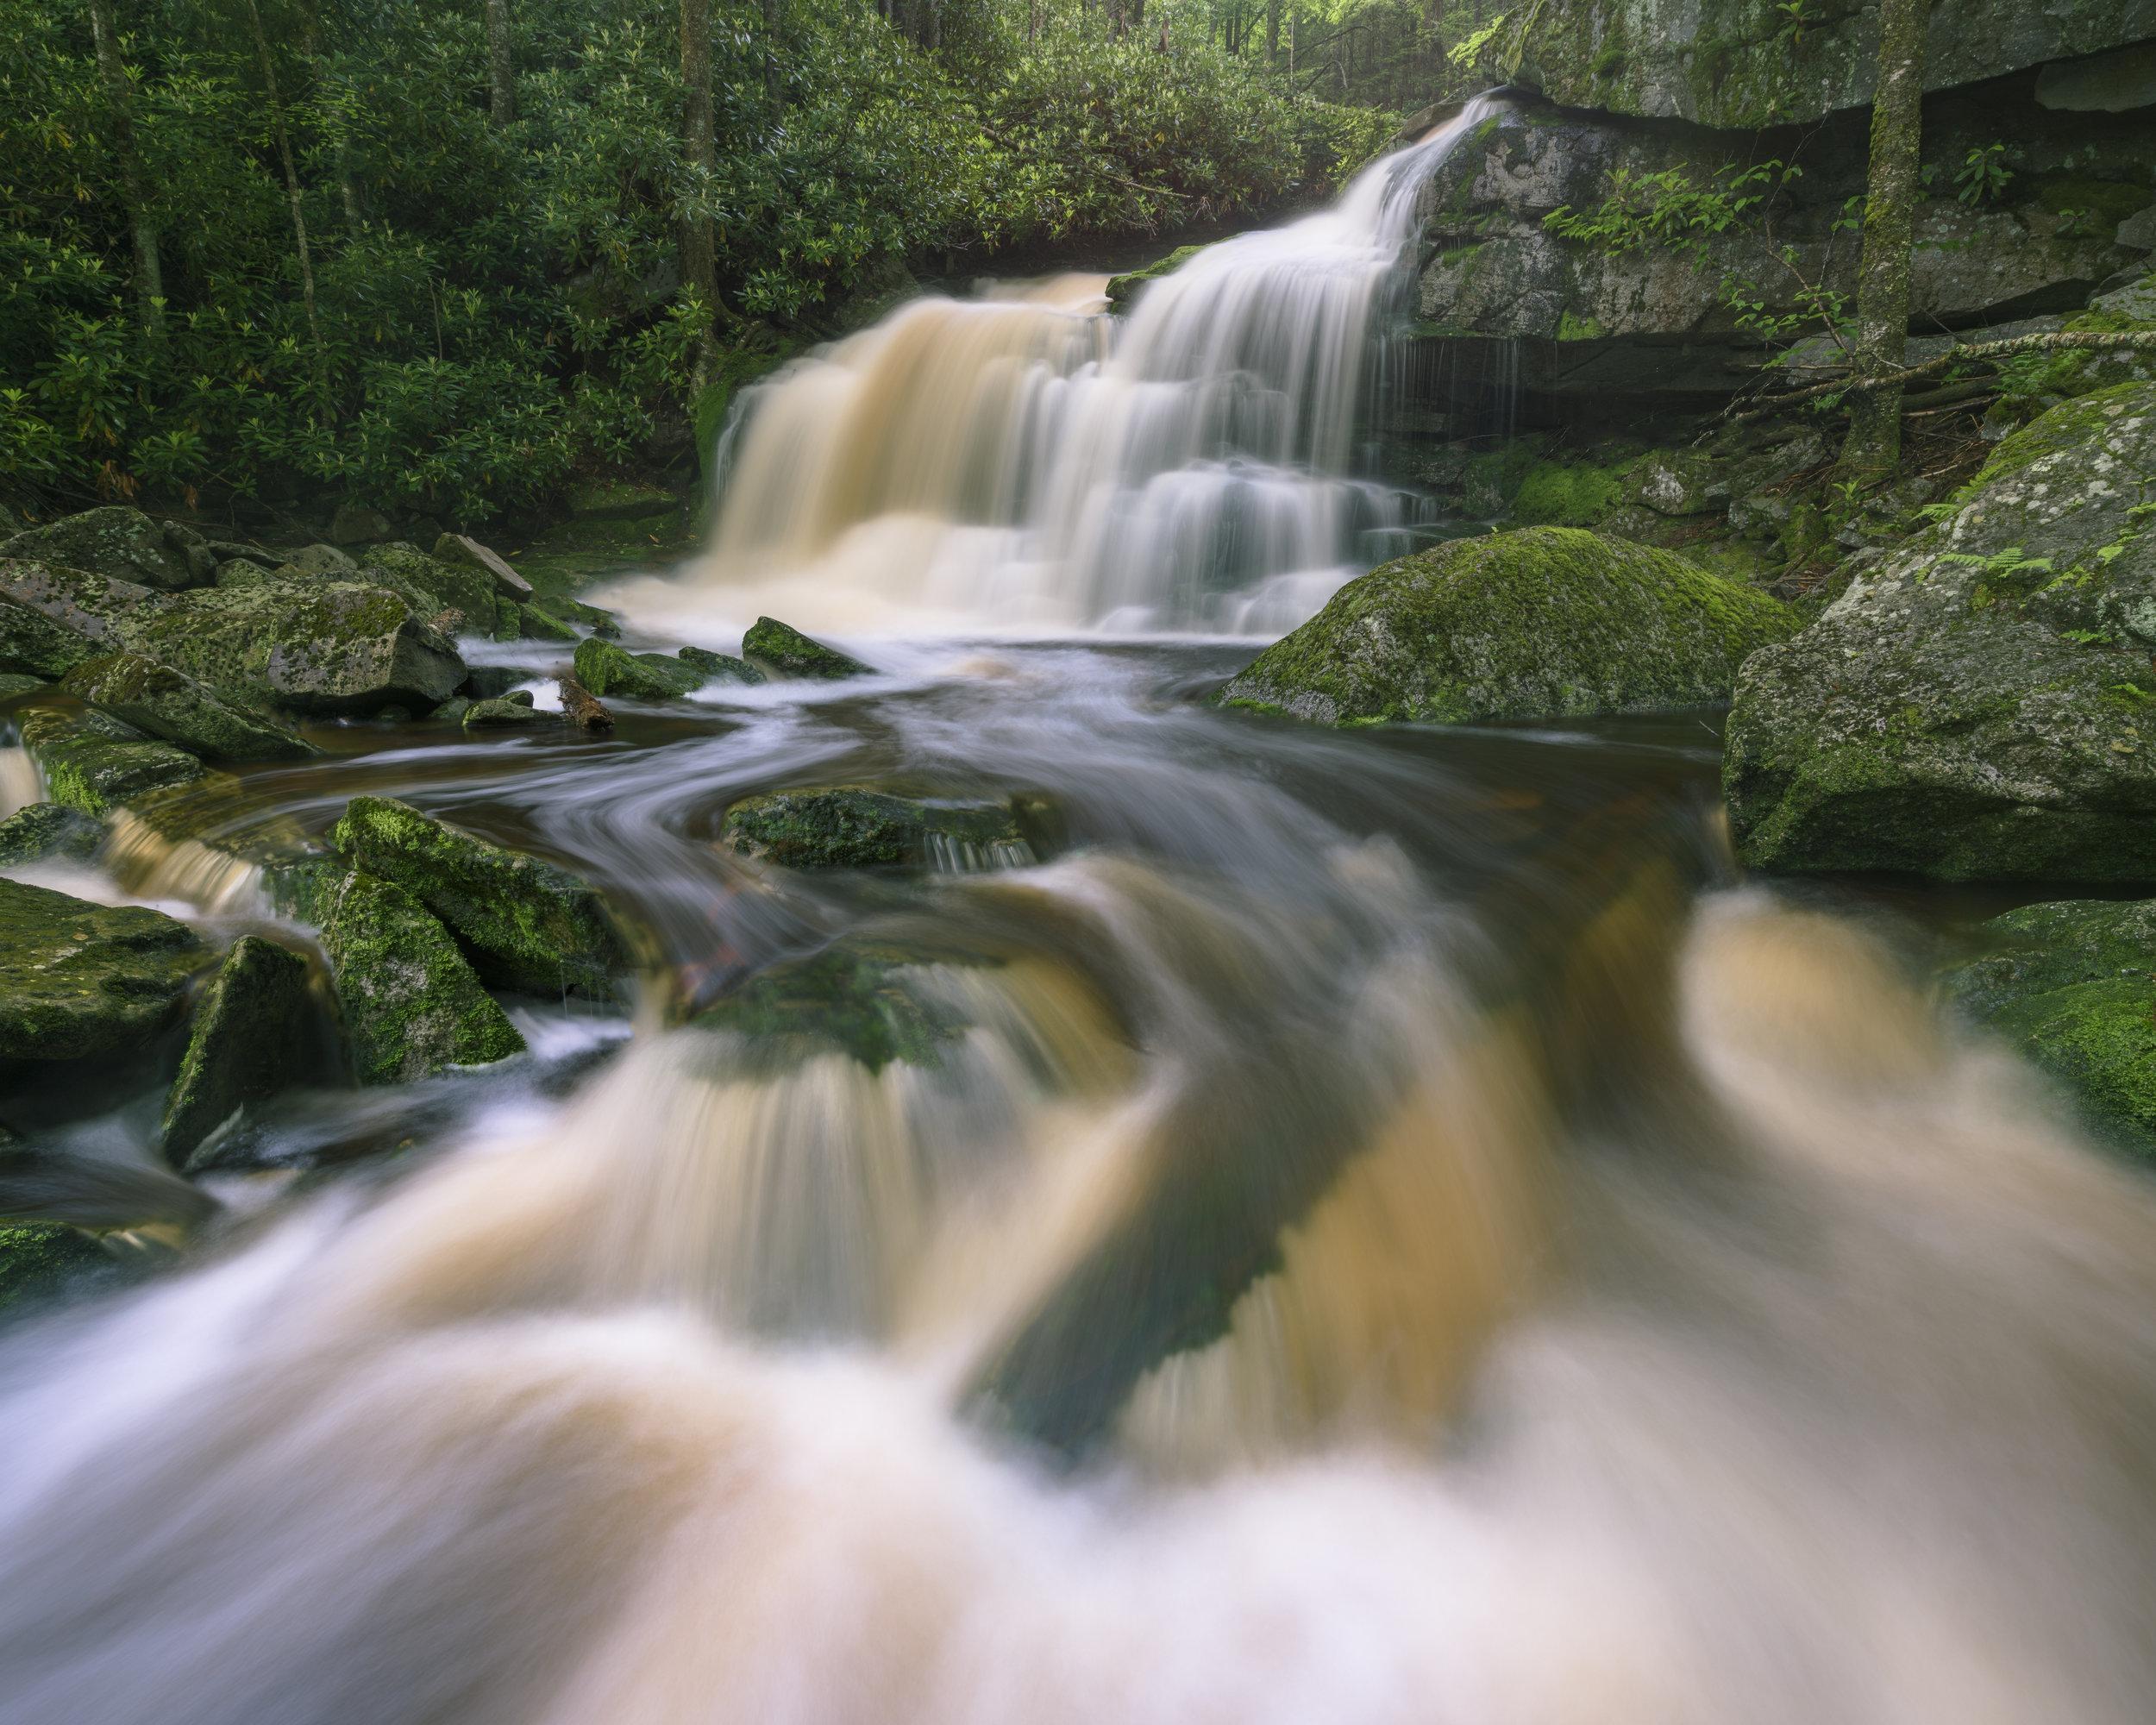 Second Falls of Shays Run, West Virginia